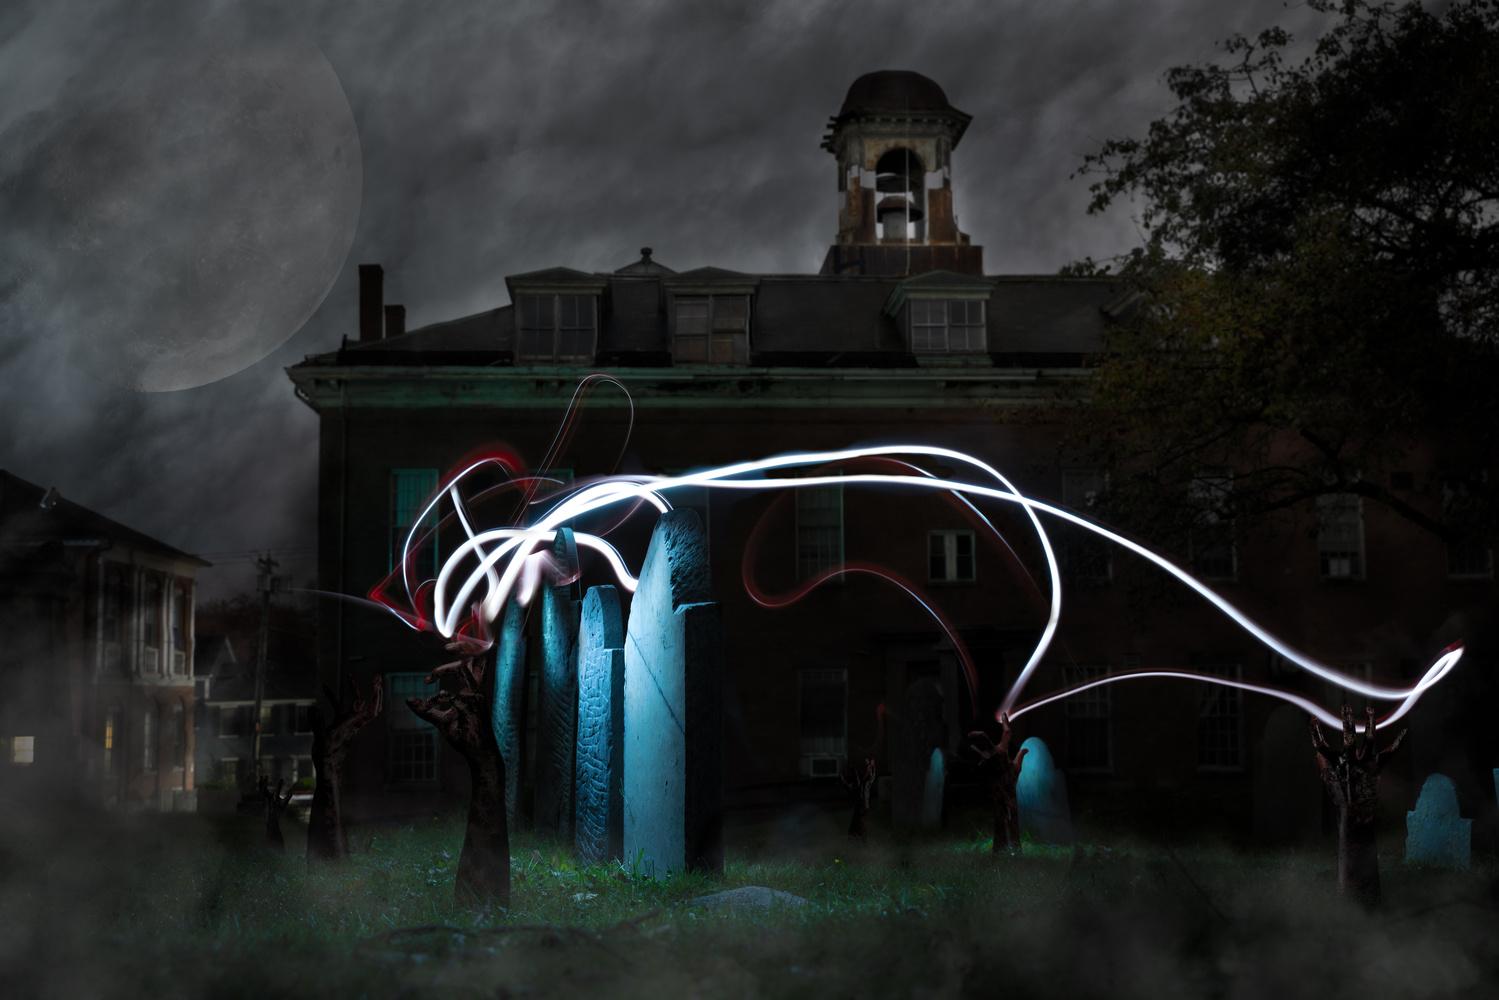 Salem Graveyard by Matthew Mindich